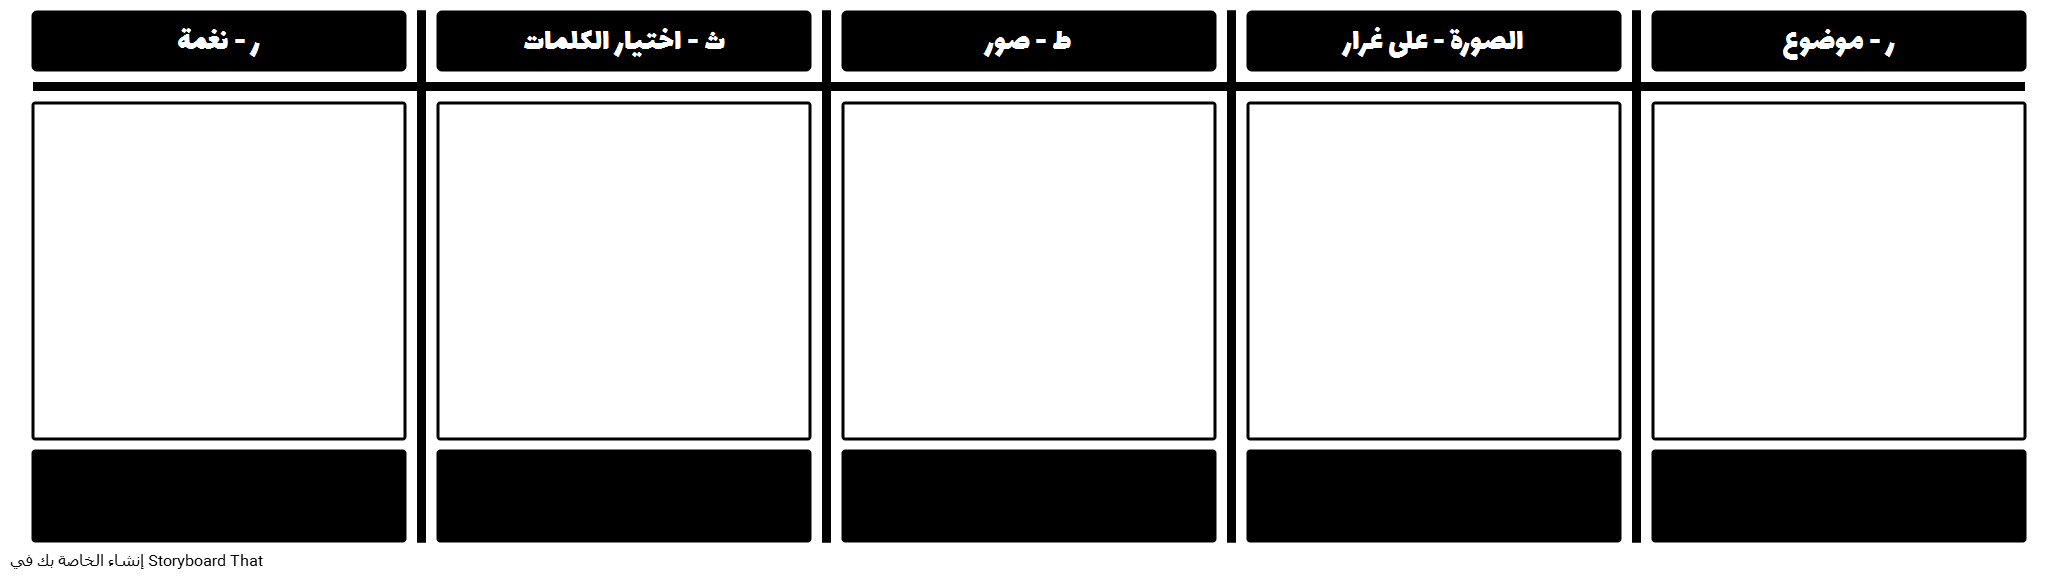 قالب تويست Storyboard by ar-examples